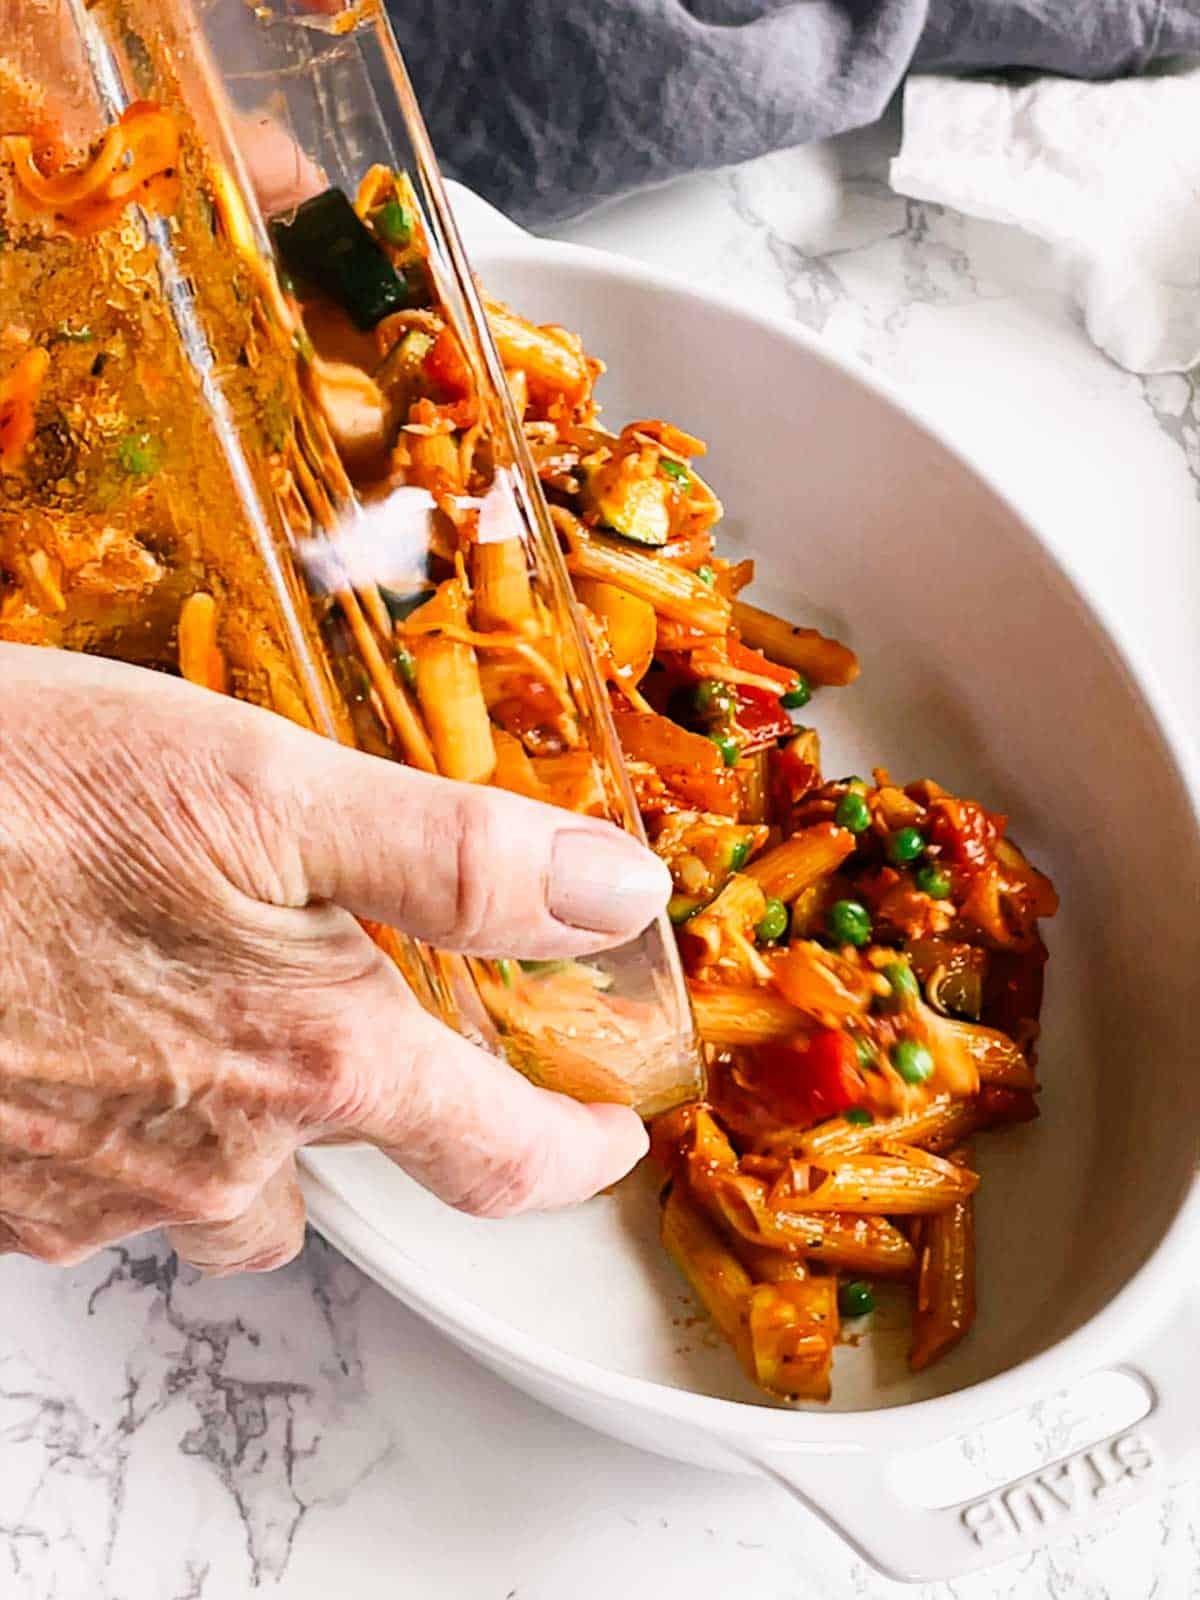 Transferring mixture to prepared casserole dish.